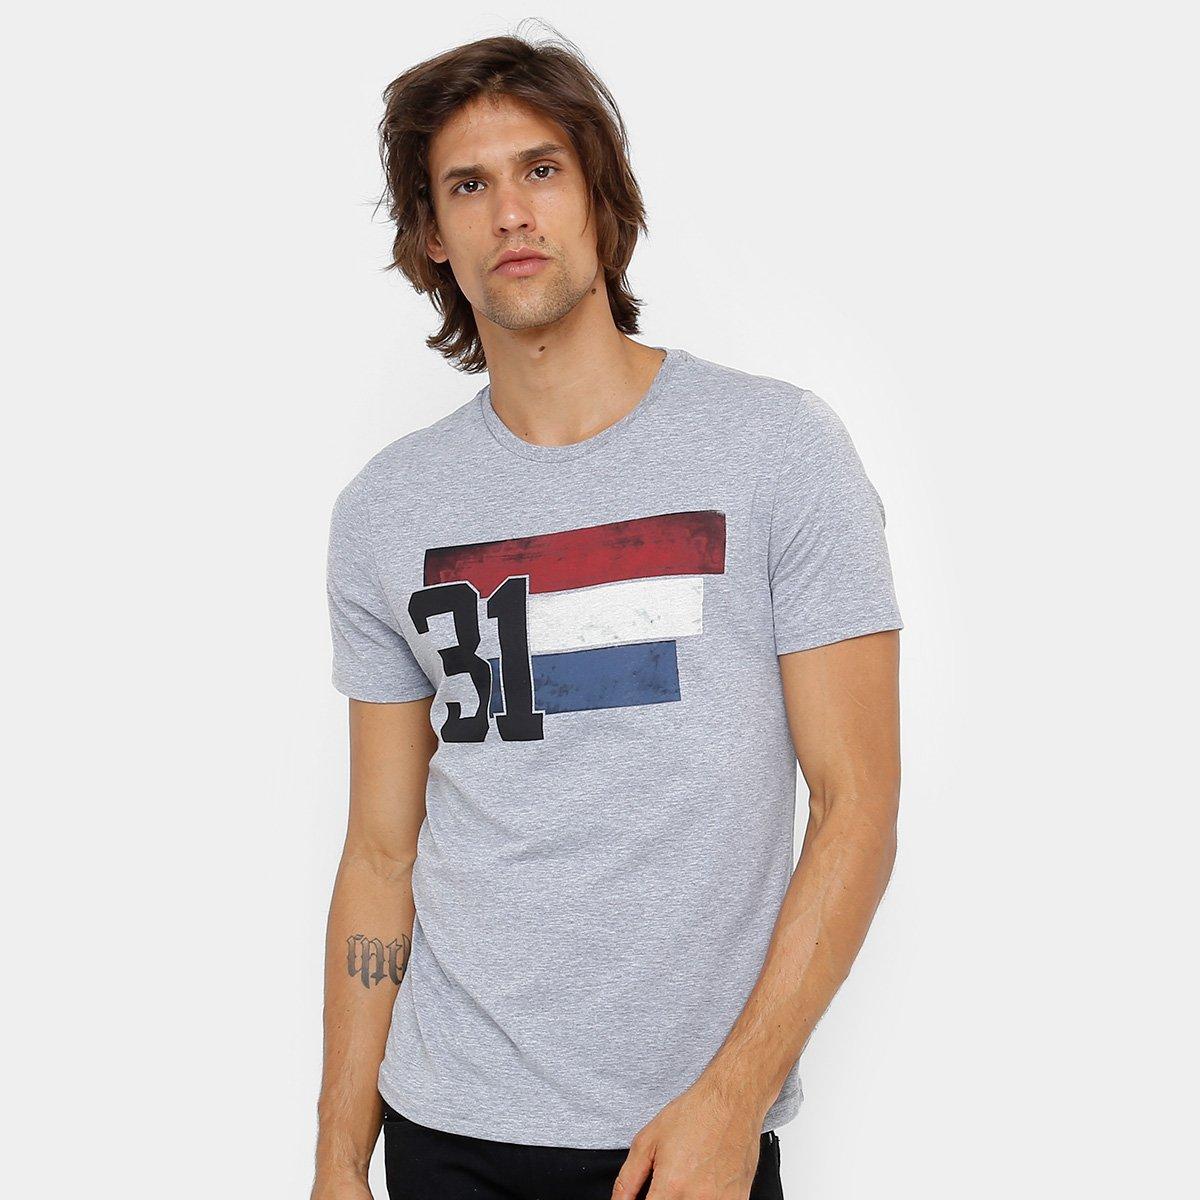 Camiseta Burn Estampa França Masculina - Compre Agora   Netshoes 334495f7c3